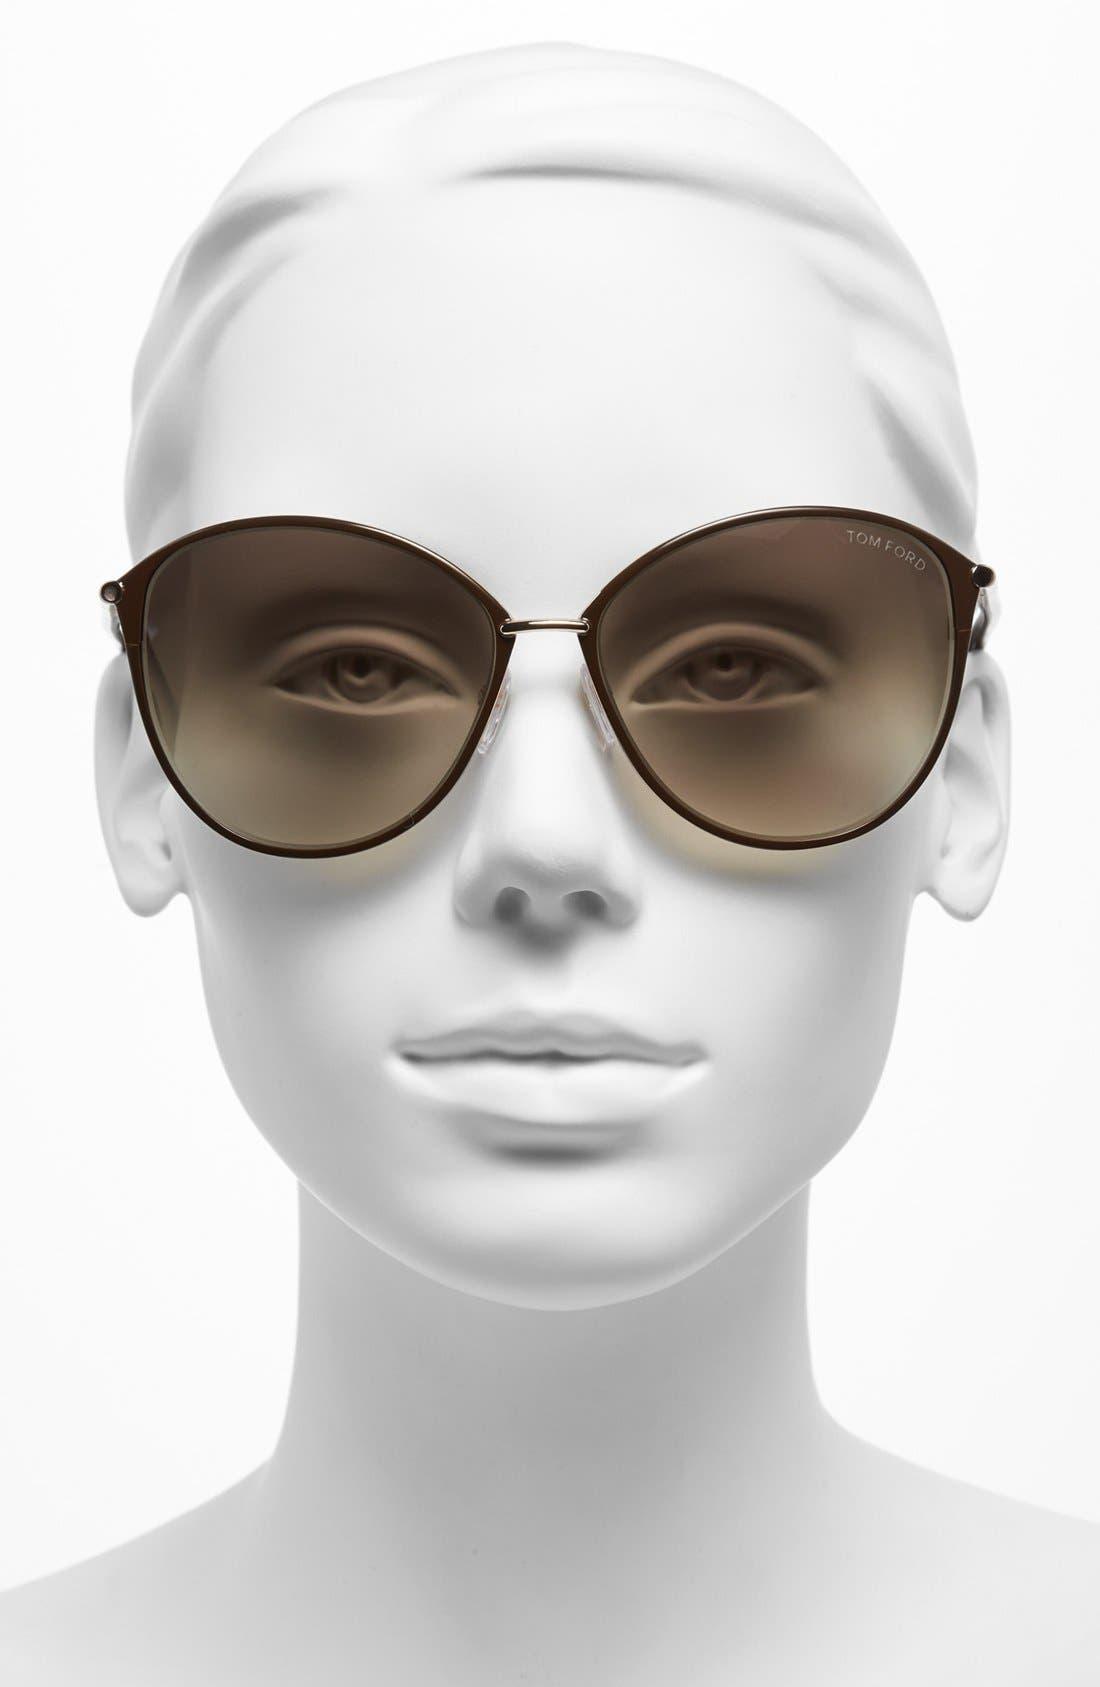 havanashn pal fashion square womens havana gallery unisex dark product accessories lyst tom glasses ford semirounded dk